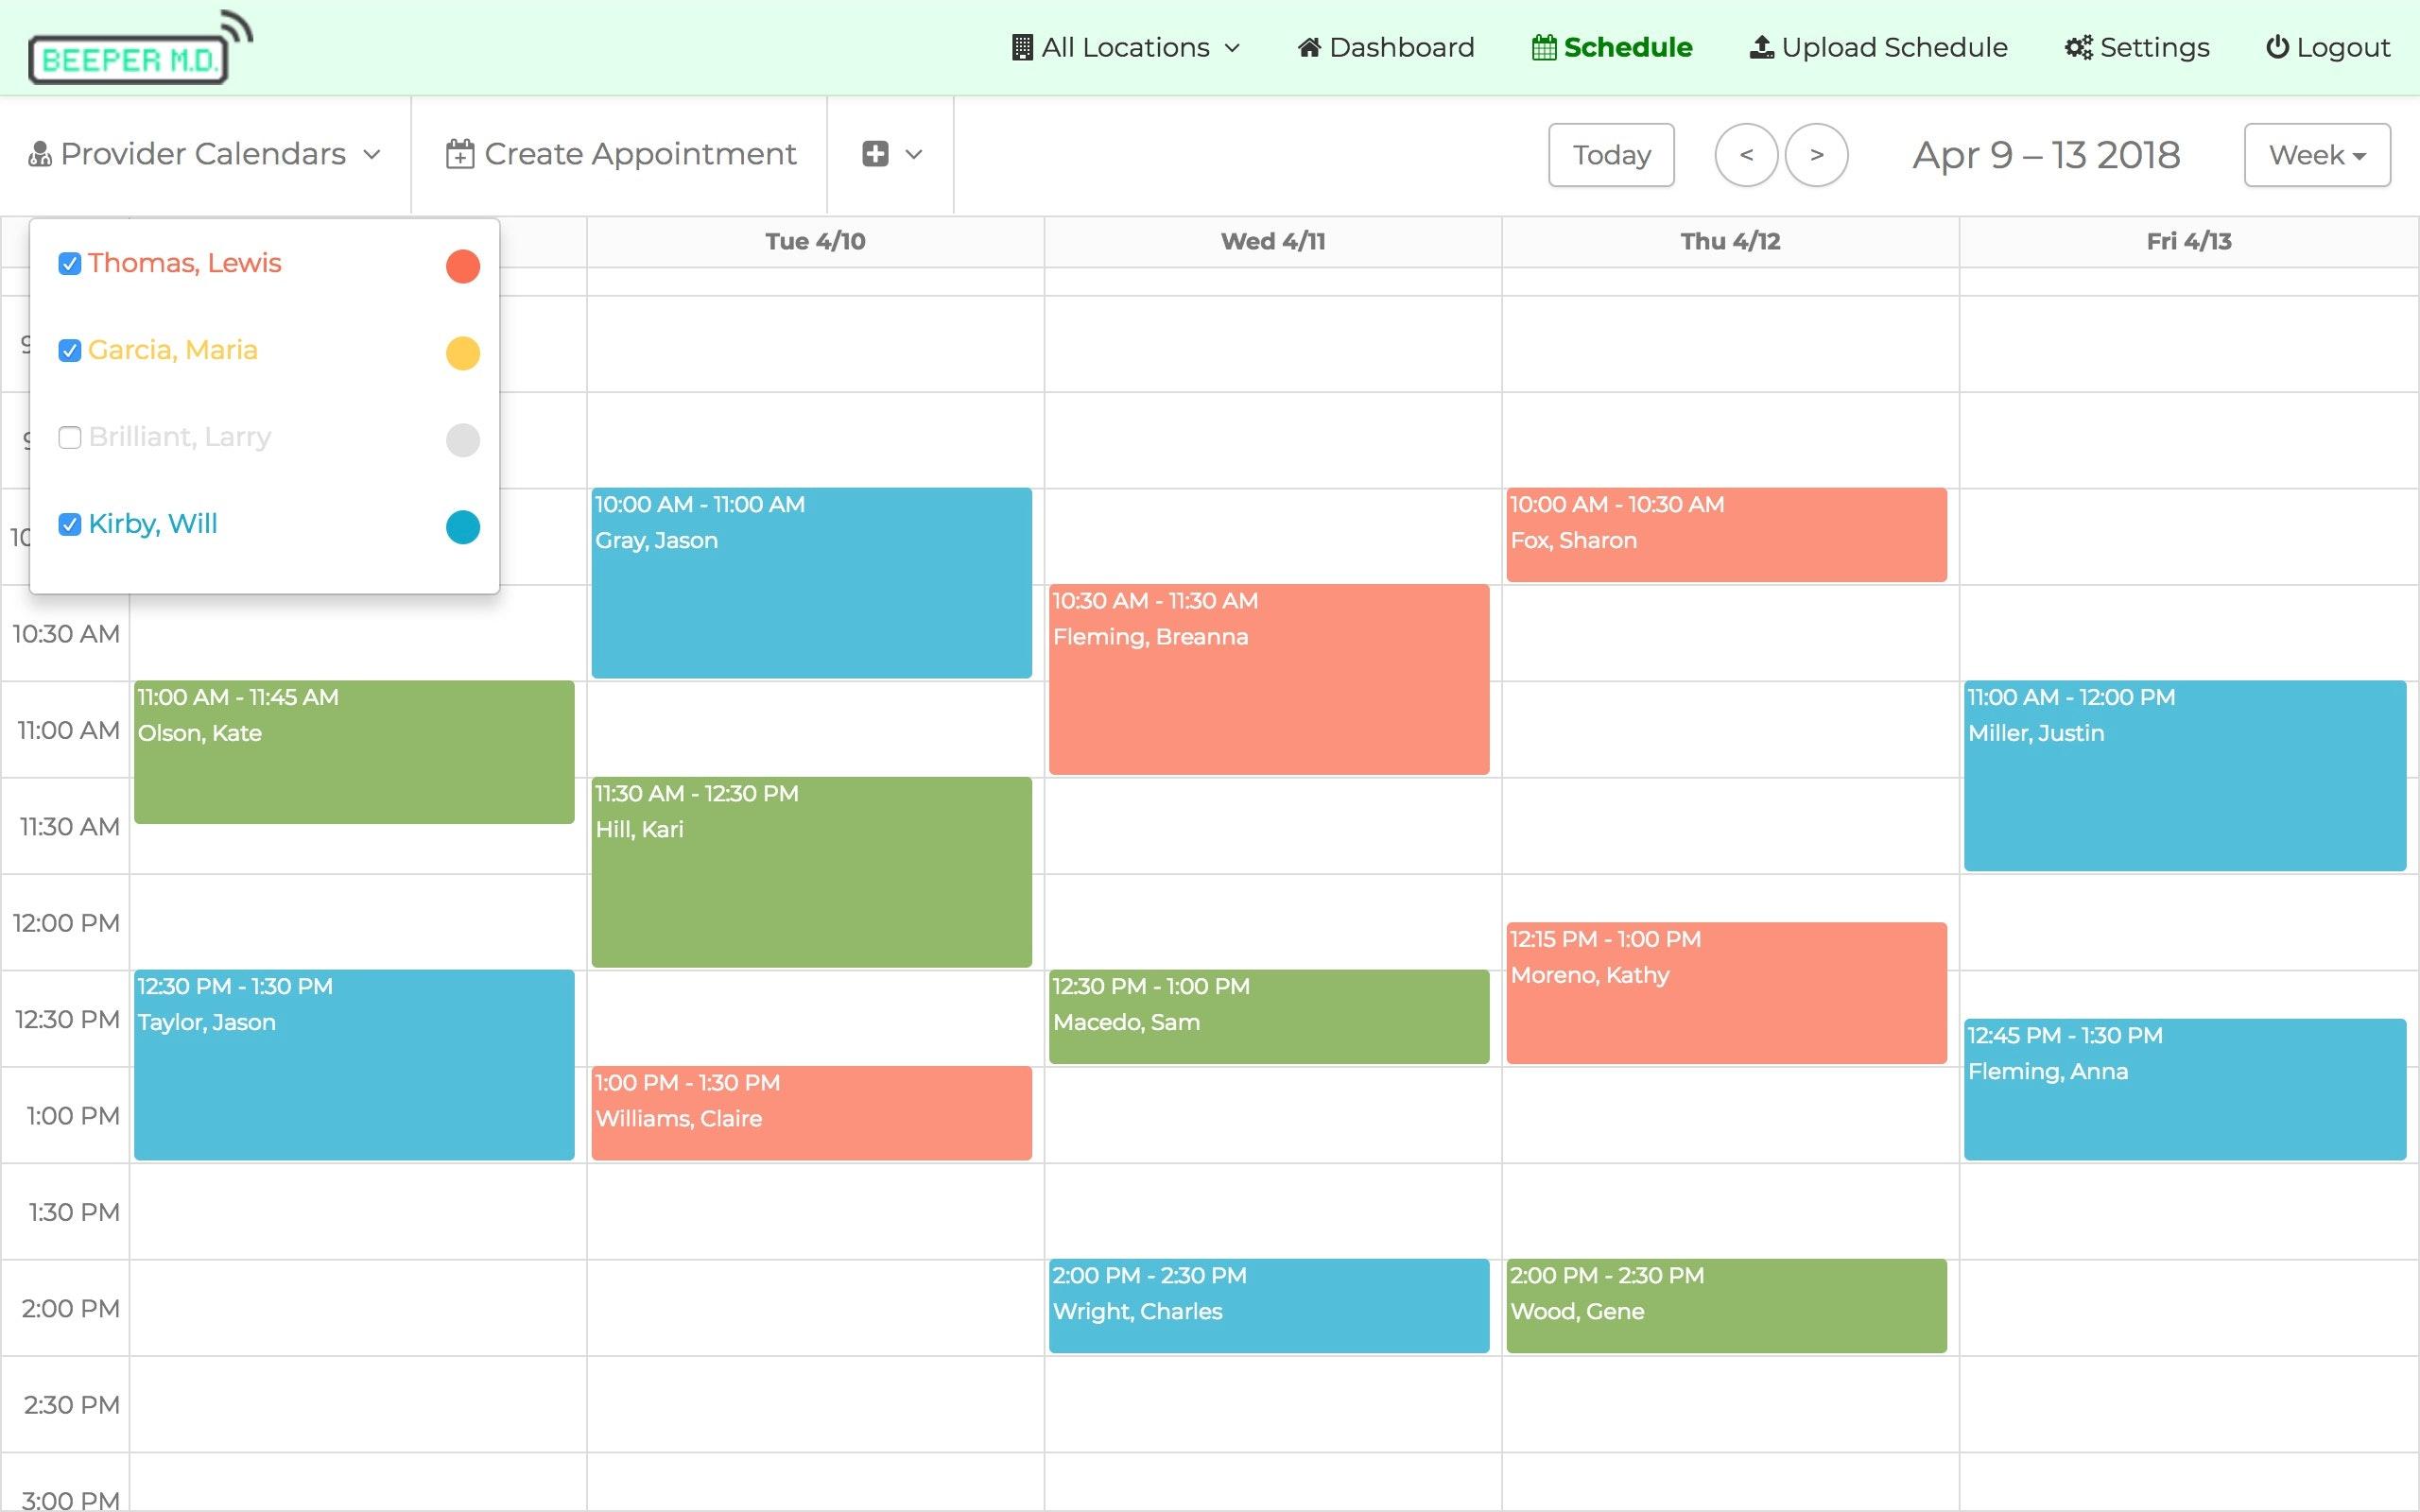 Provider calendars